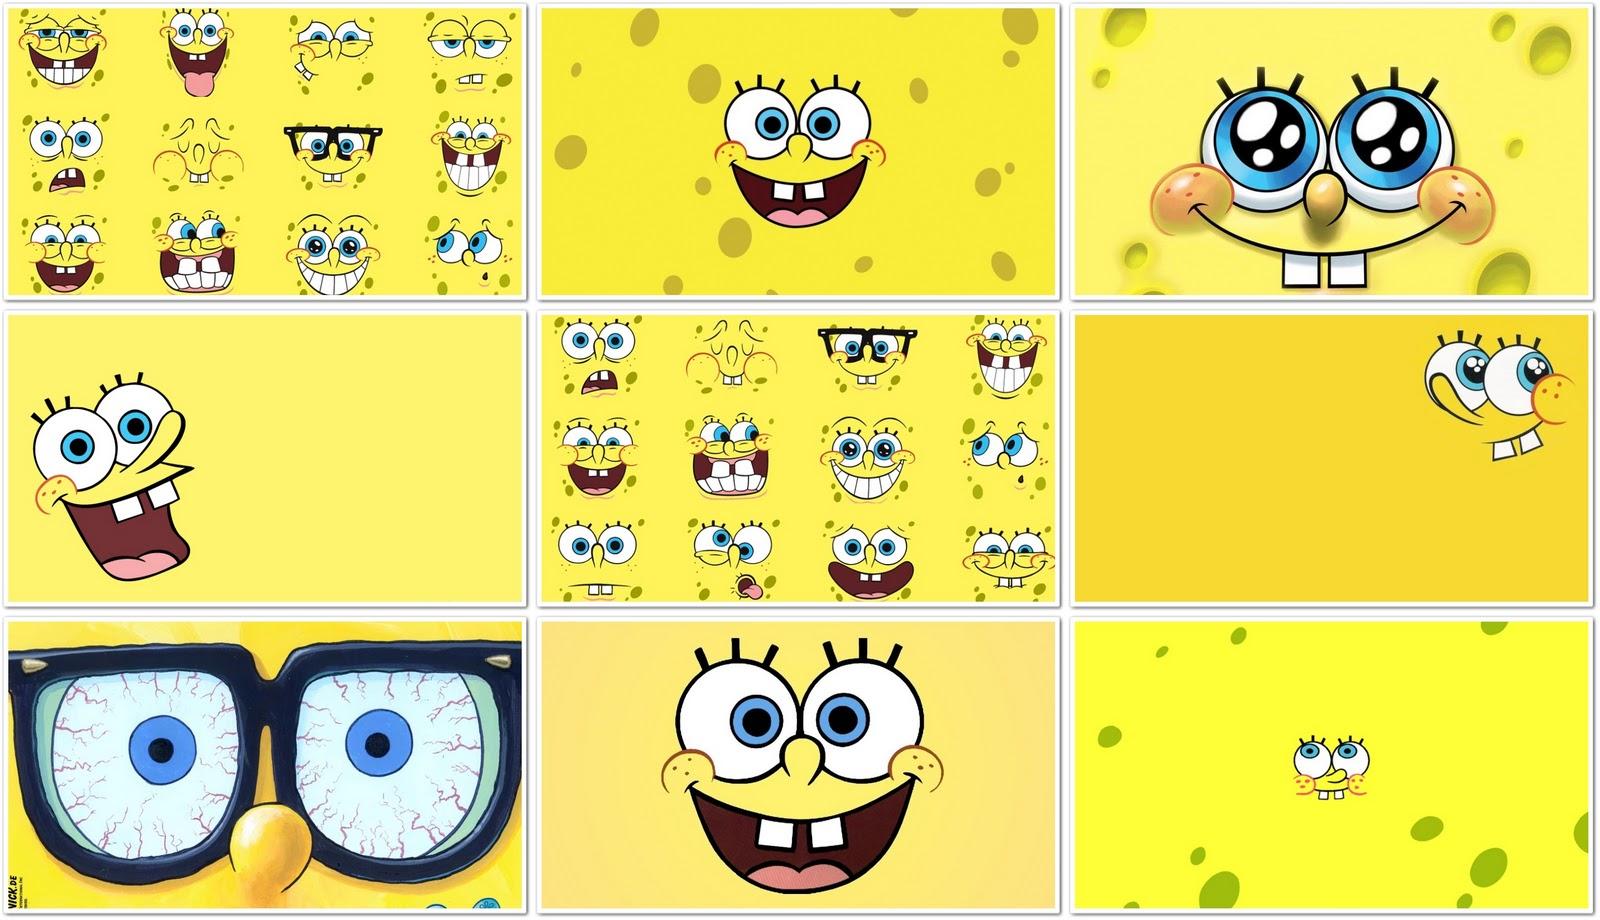 Best Images About Spongebob Phone Wallpaper On Pinterest Desktop Spongebob Wallpaper Hd 1600x920 Wallpaper Teahub Io